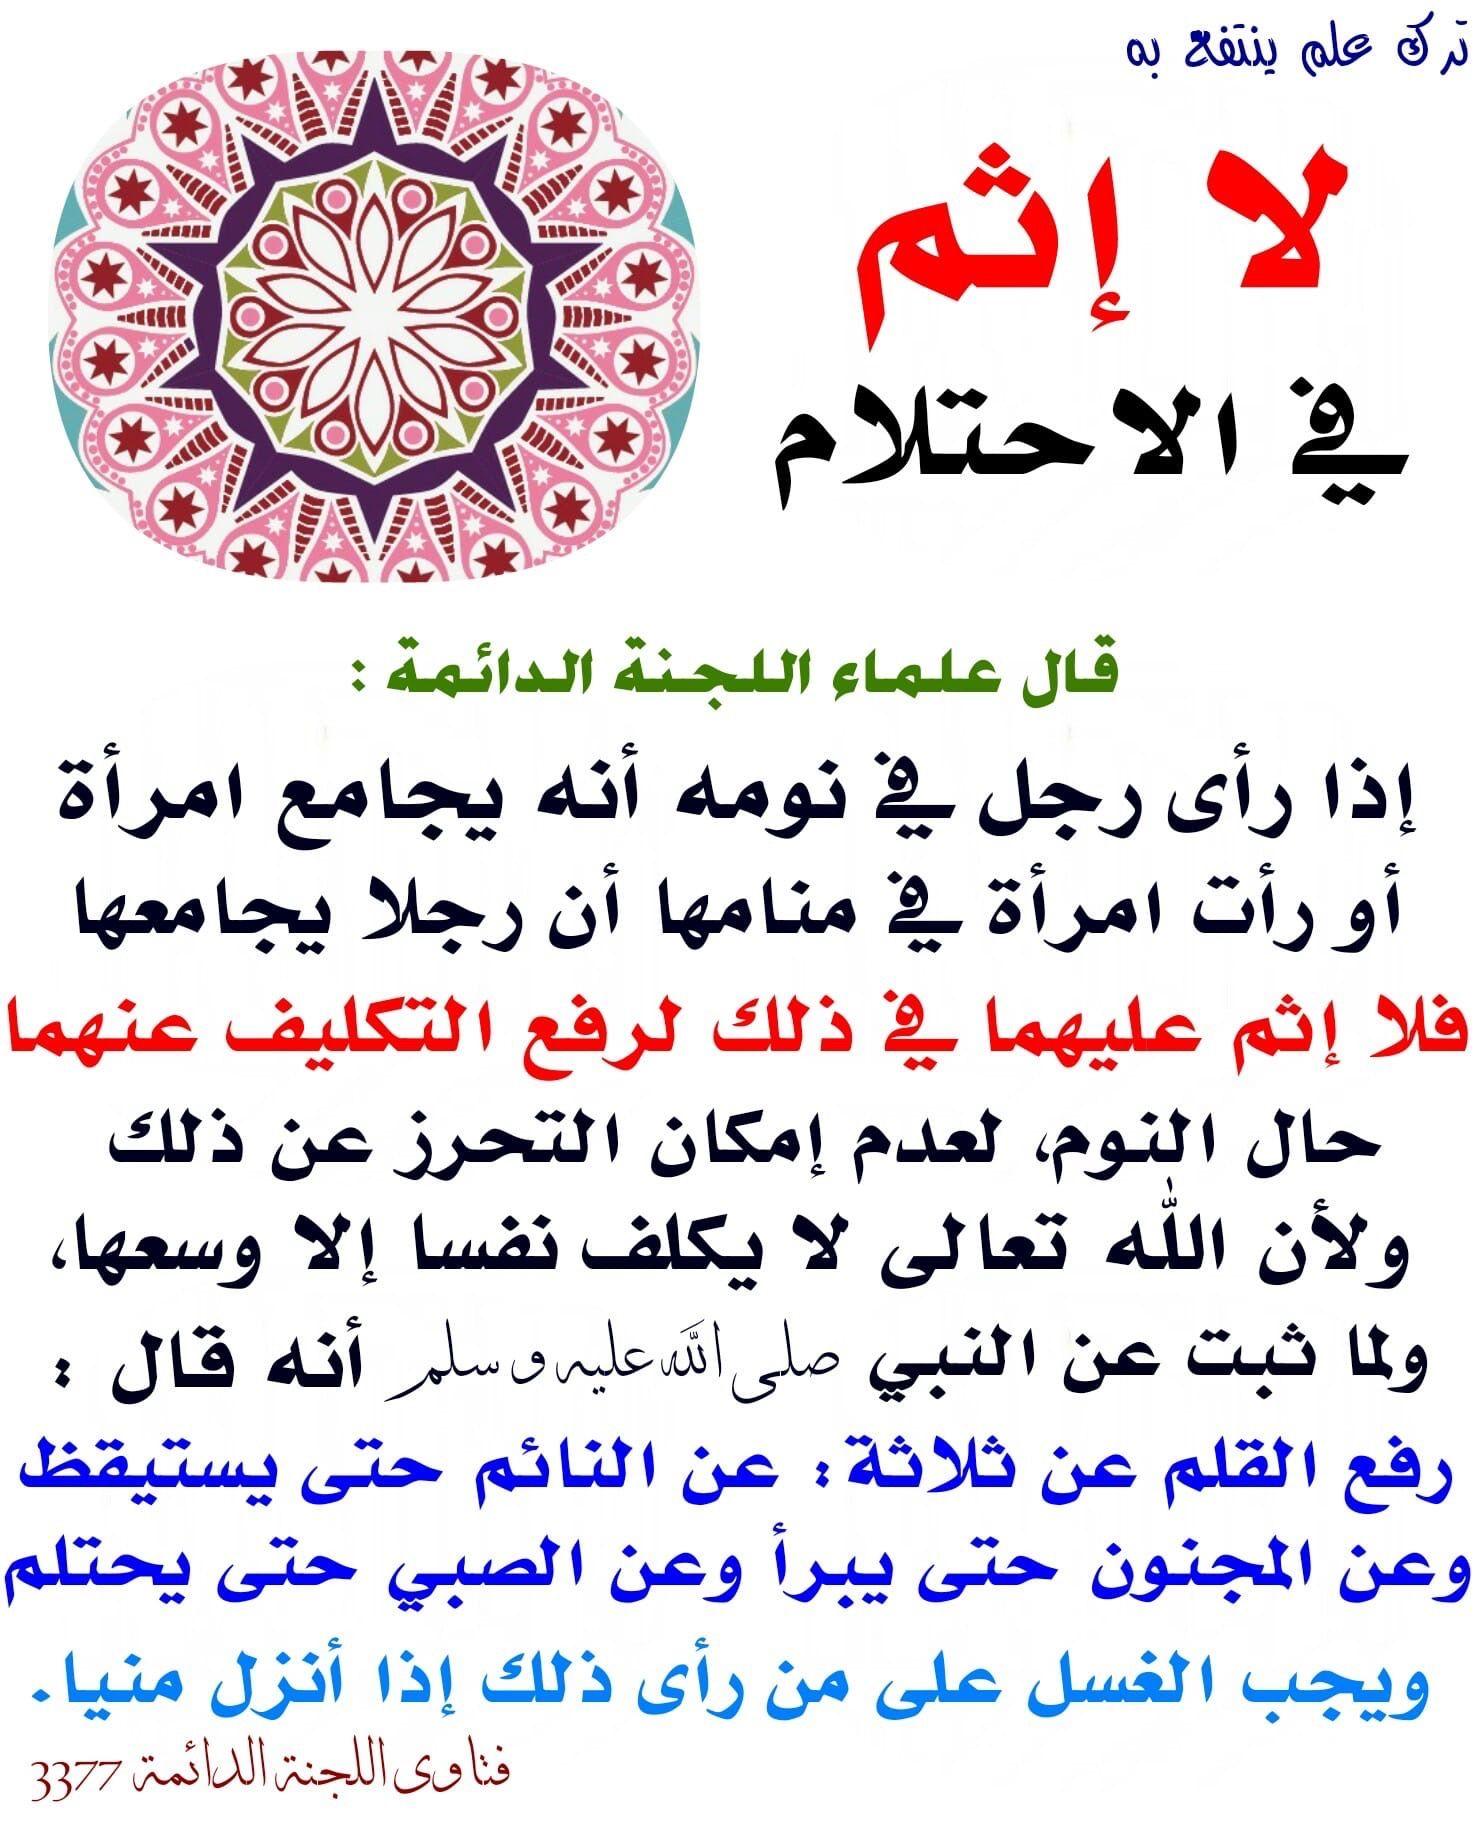 Pin By رياض بوخروبة أبو خديجة On فتاوى Islam Facts Islamic Quotes Islamic Images